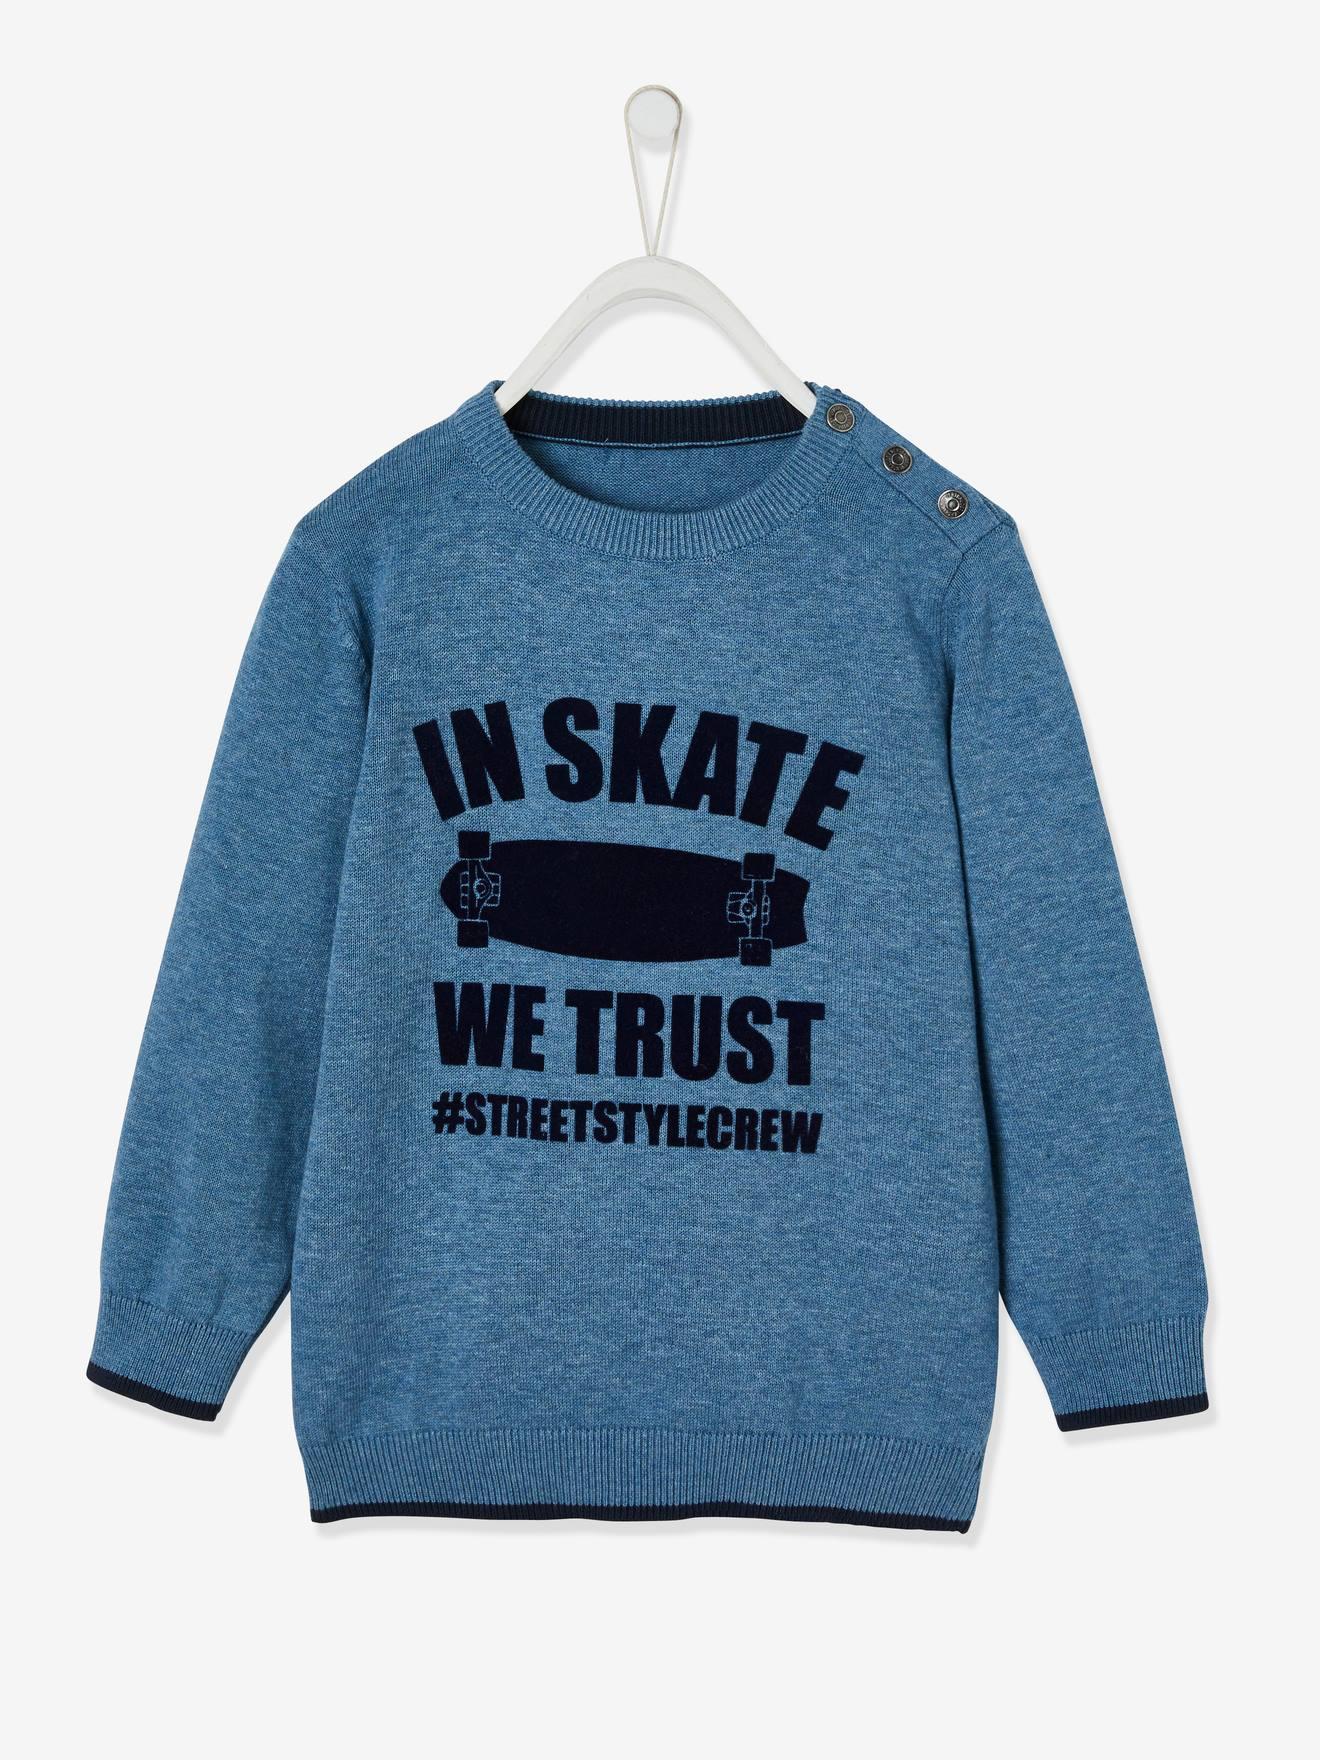 Boys Pulls Hoodies Sweatshirts Tops avec défauts